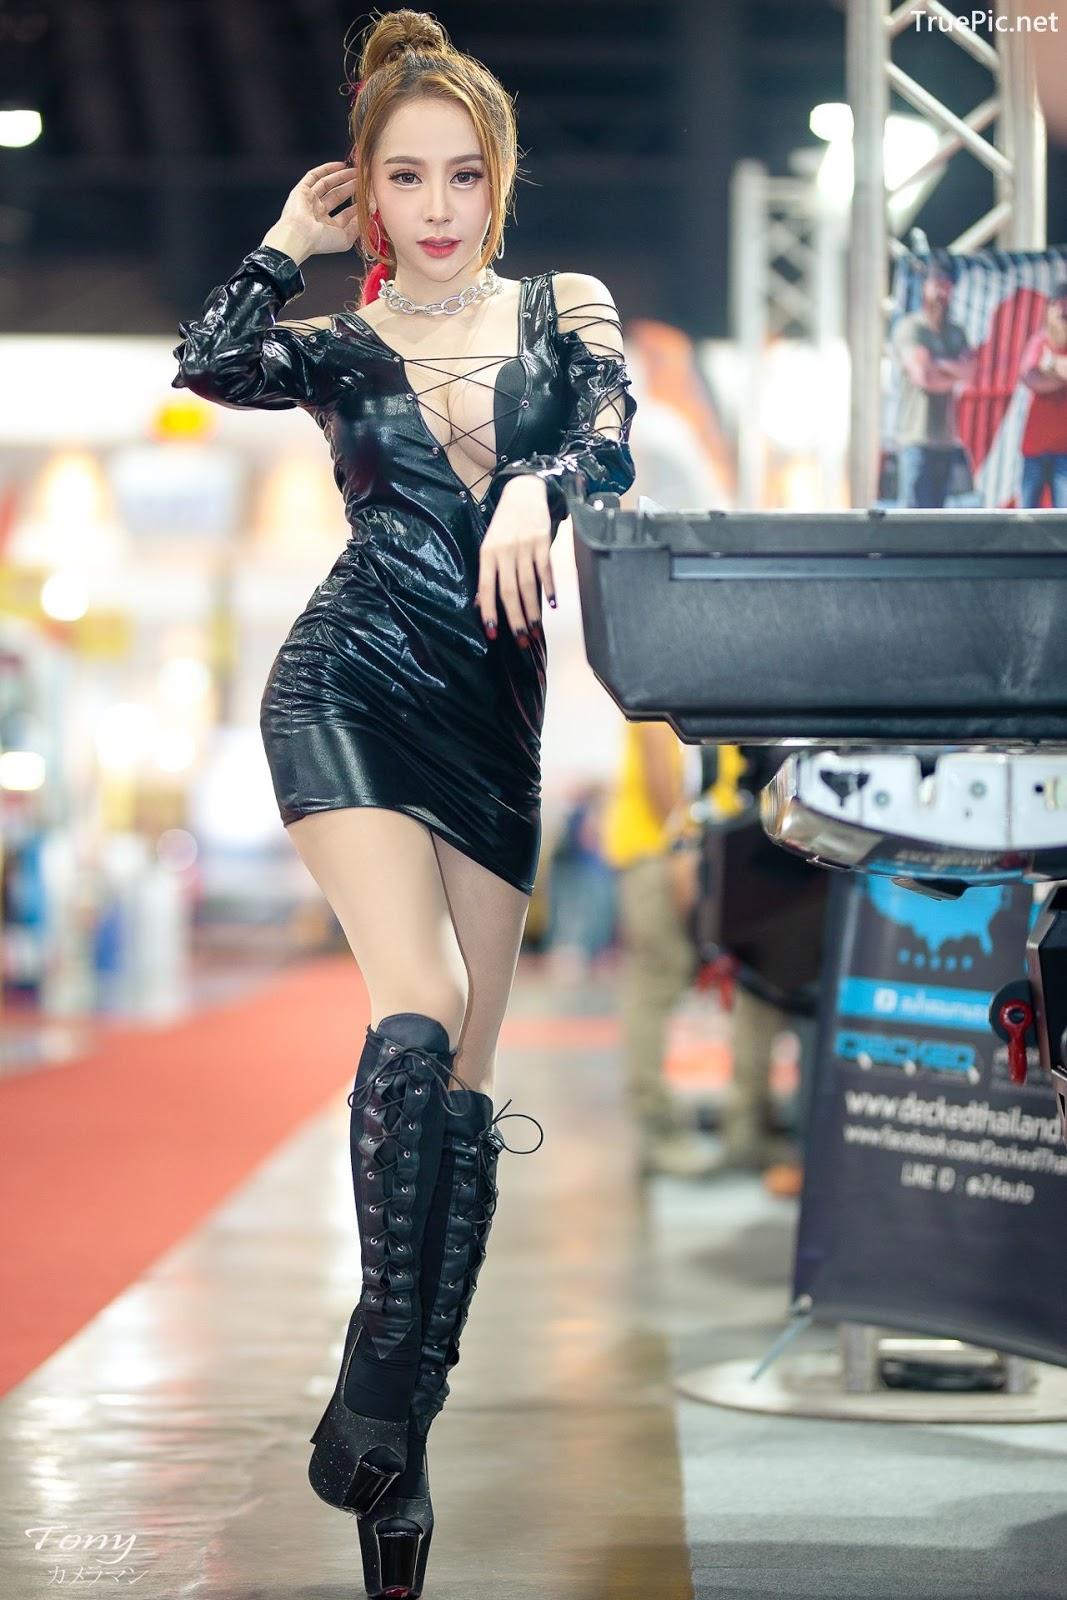 Image-Thailand-Hot-Model-Thai-Racing-Girl-At-Bangkok-Auto-Salon-2019-TruePic.net- Picture-2